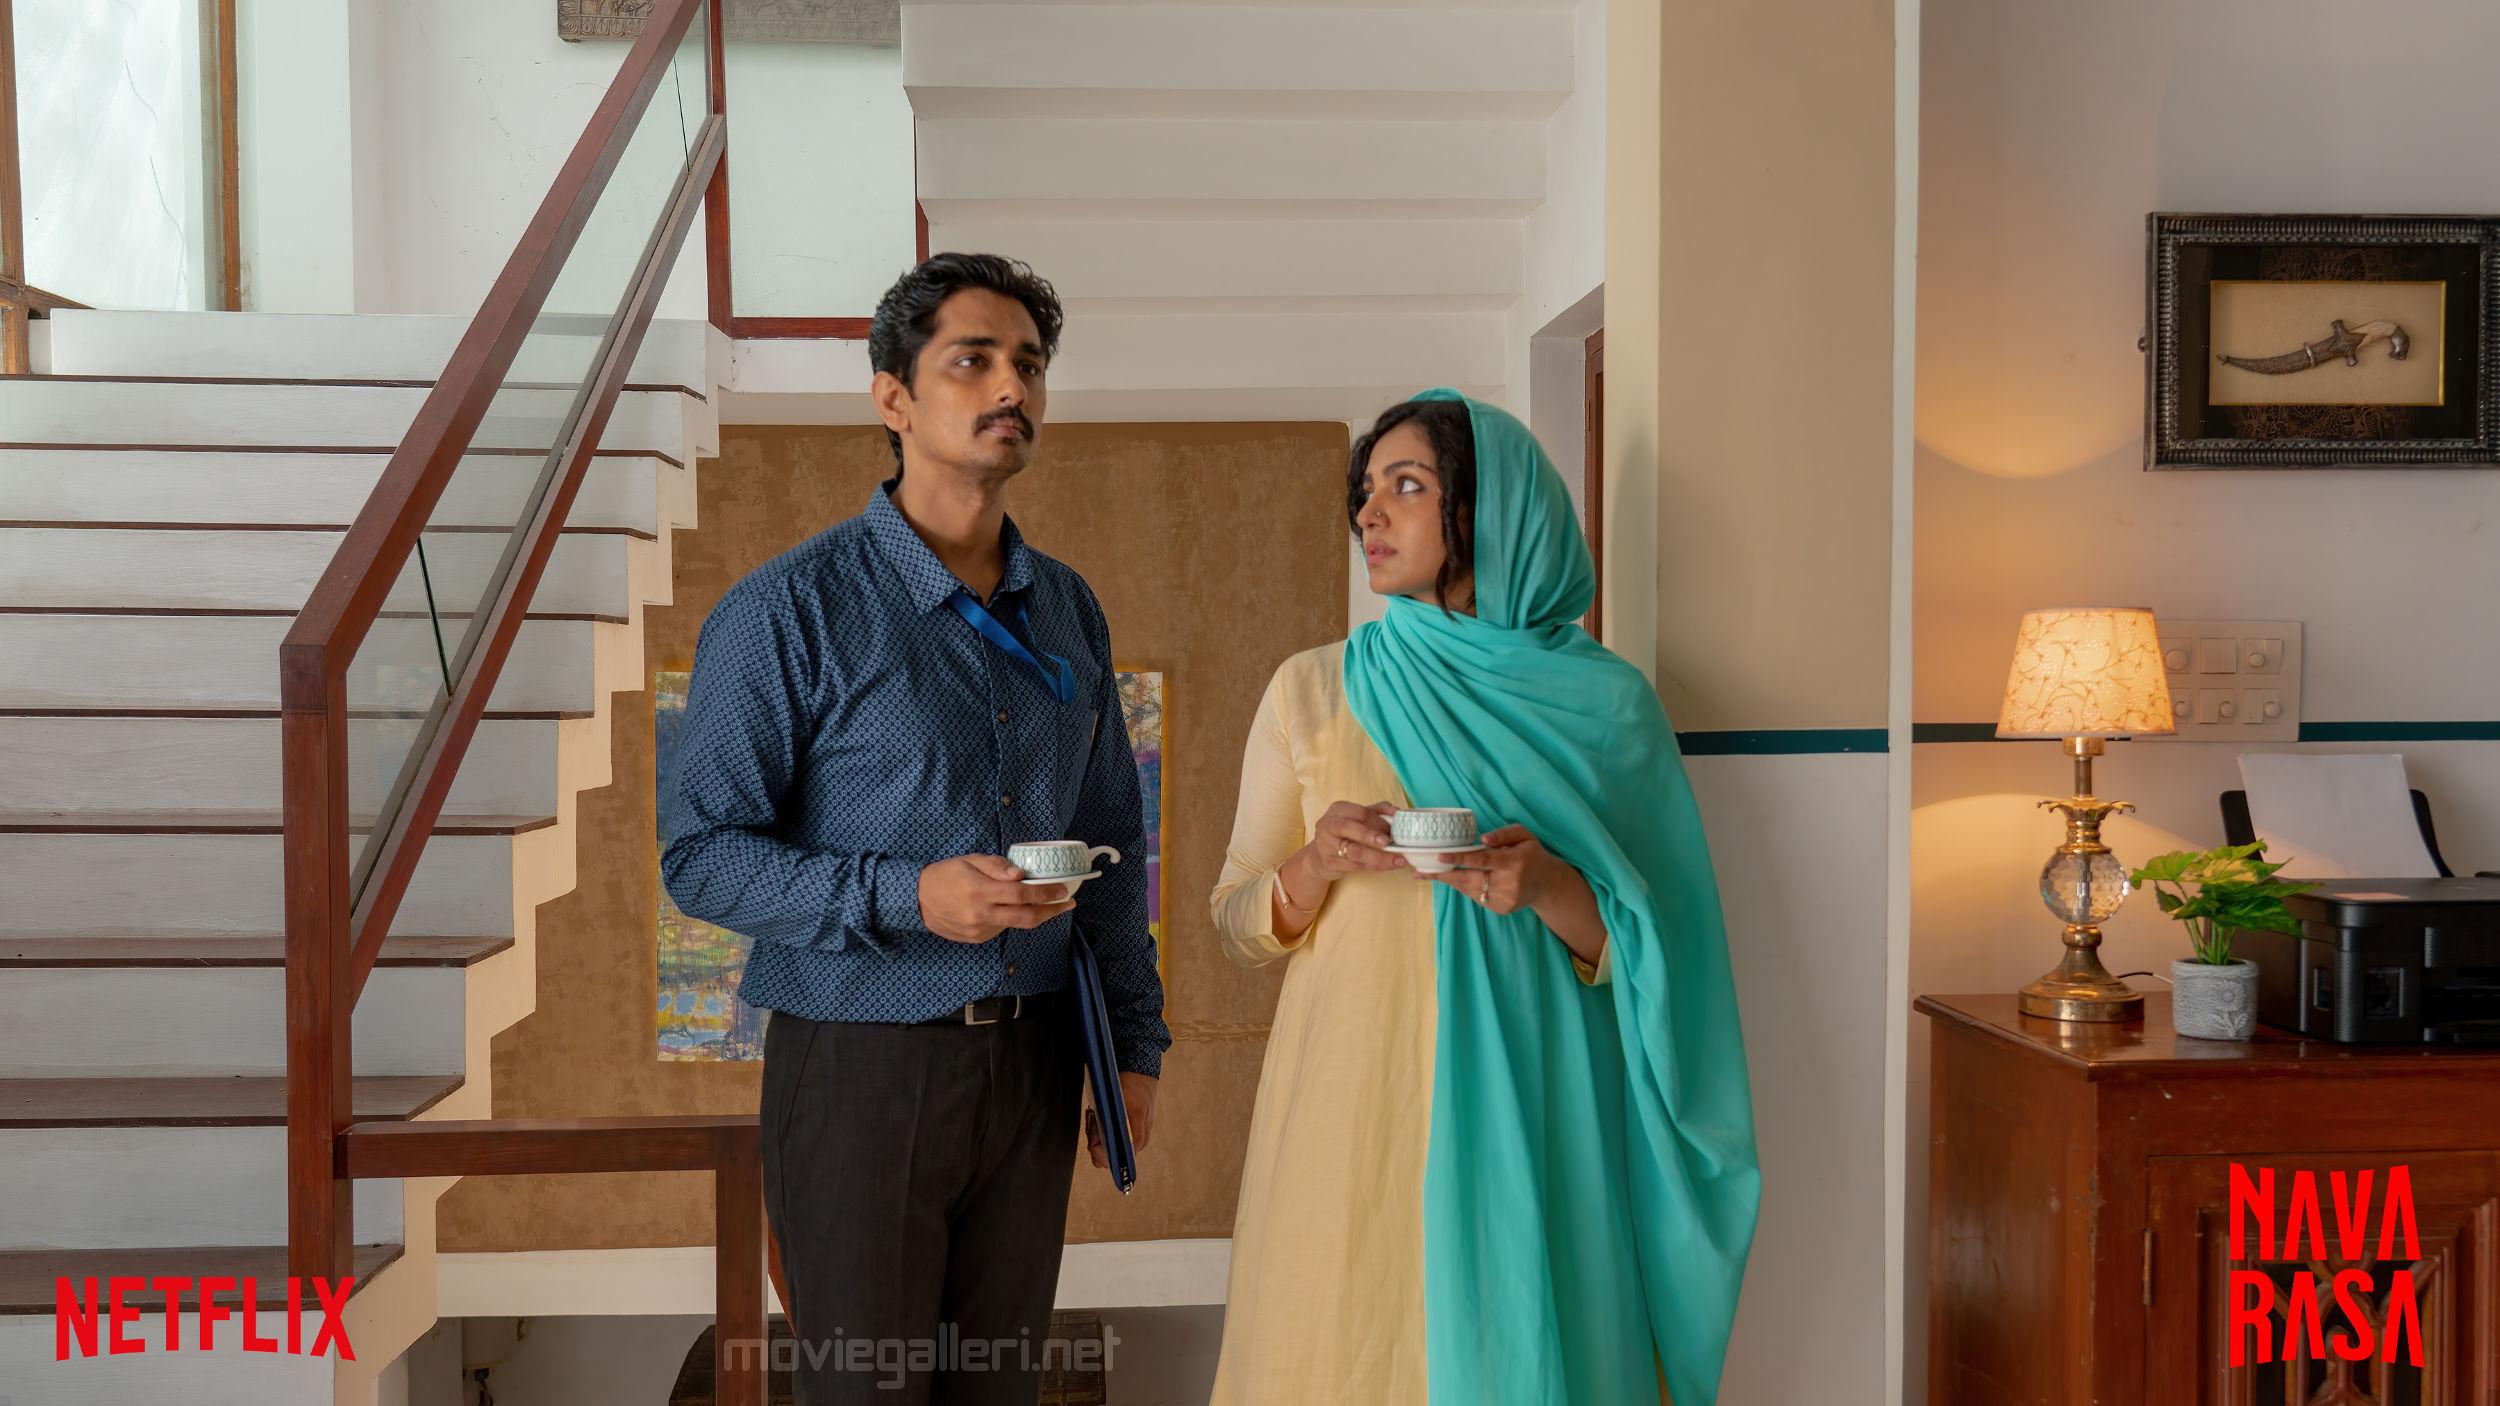 Actor Siddharth Actress Parvathy in Inmai Navarasa Web Series HD Pics